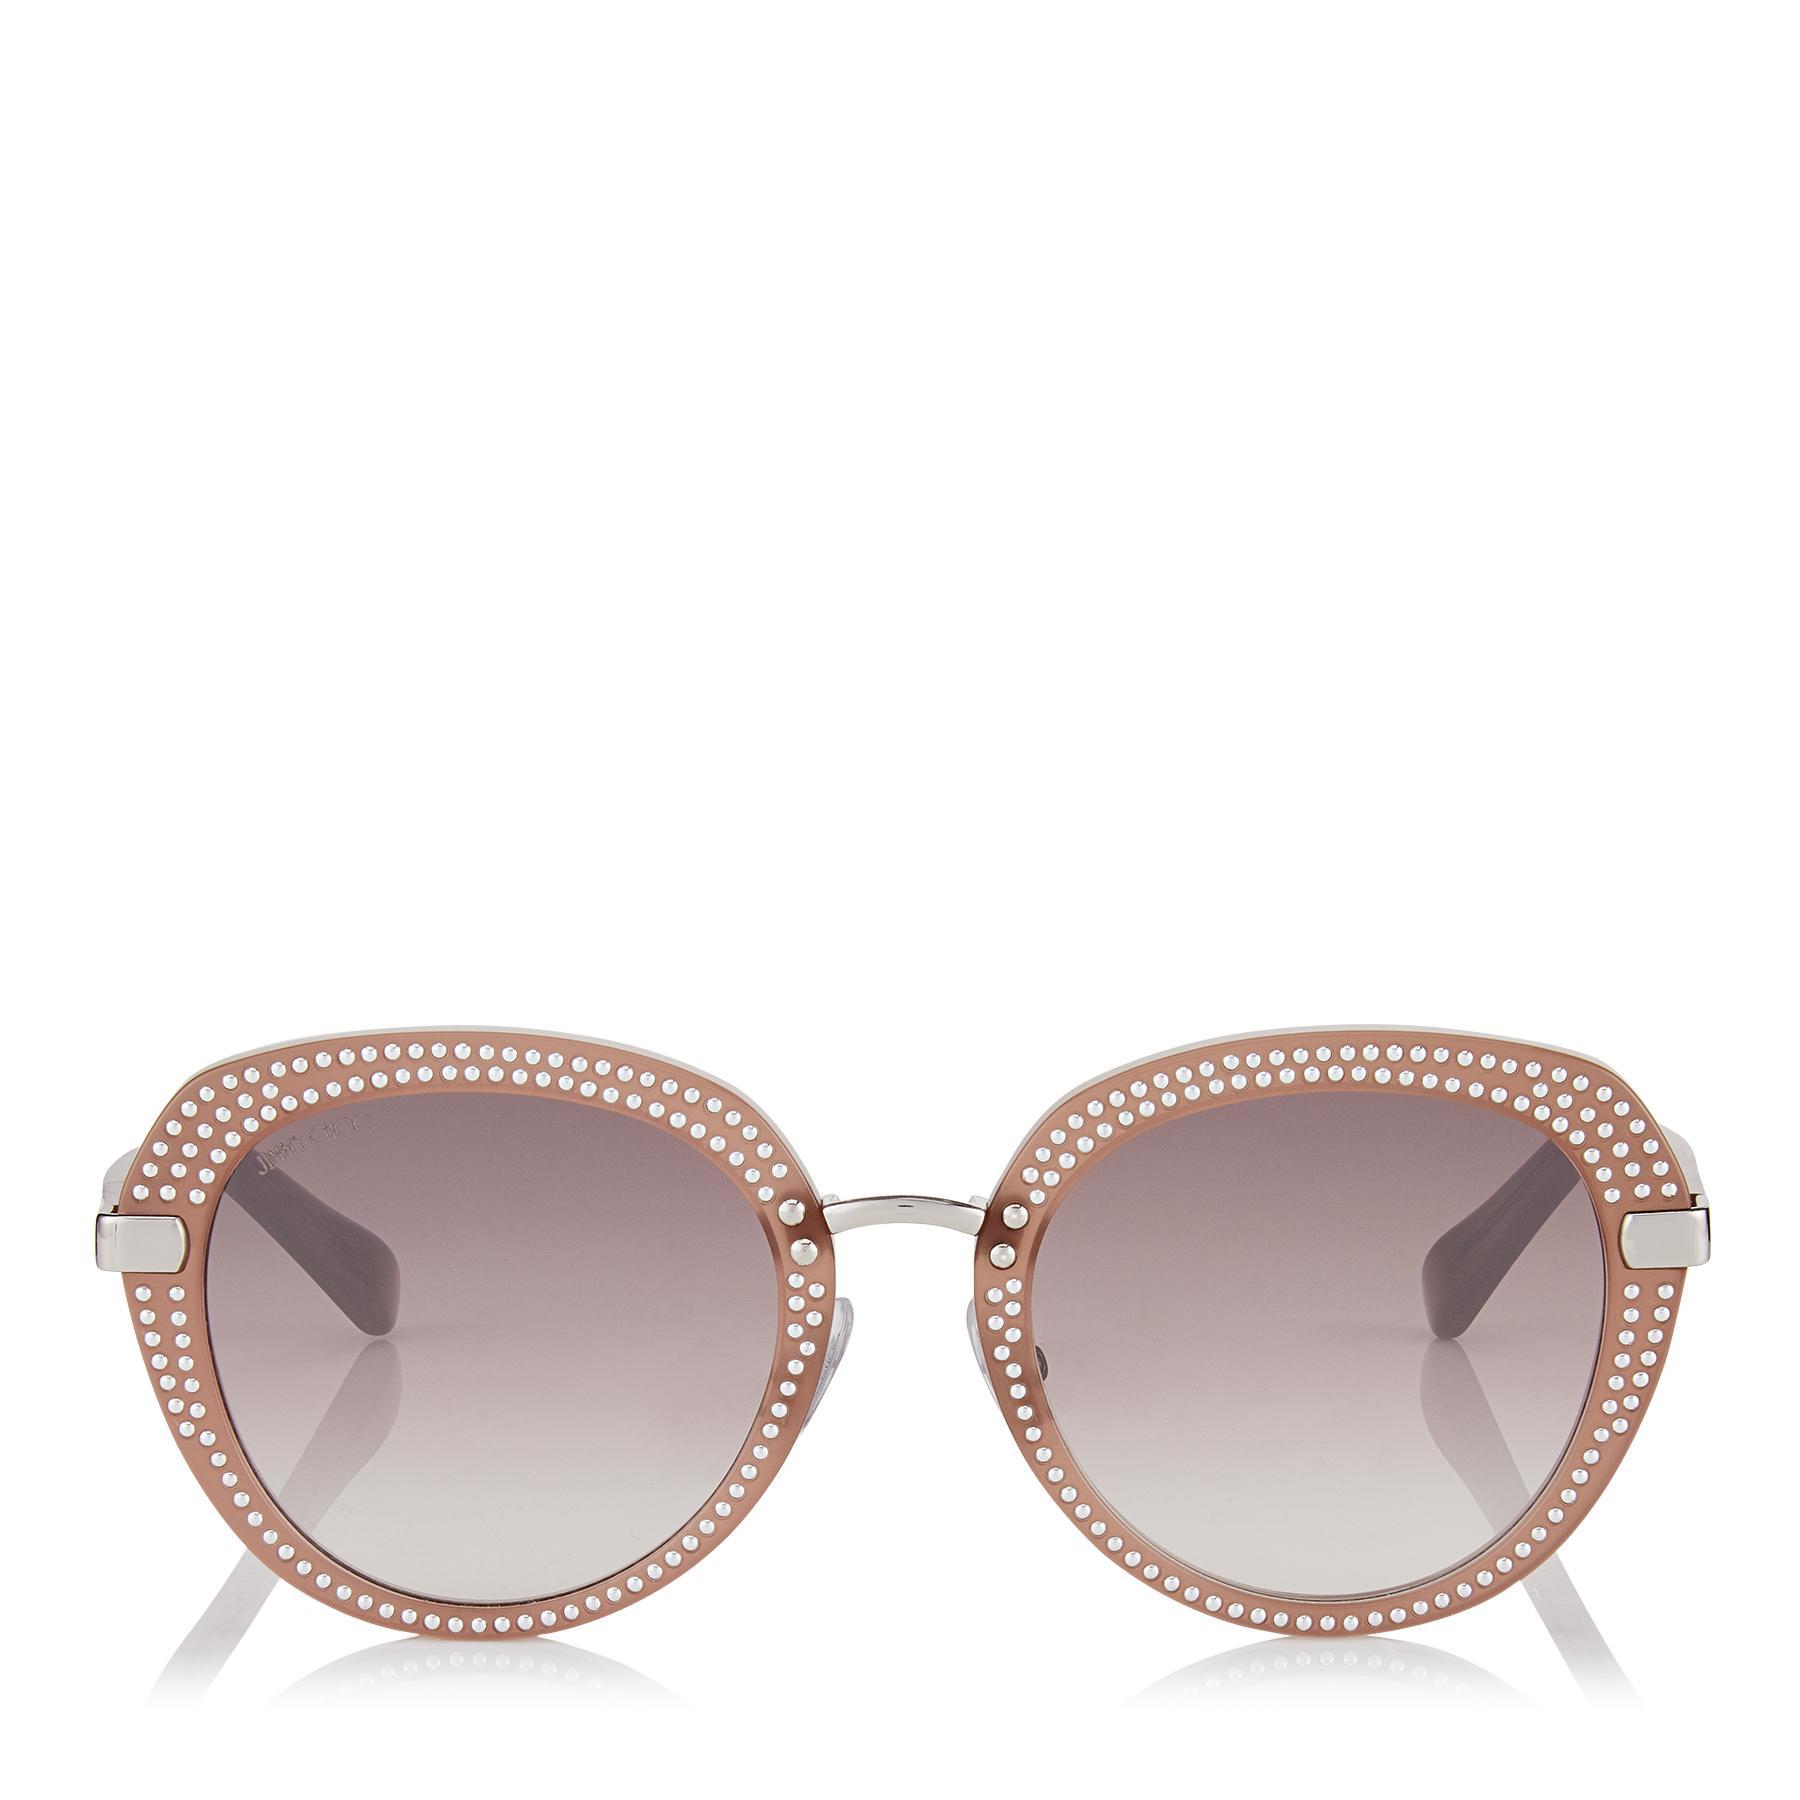 e3a86ac7a568 Jimmy Choo Mori Opal Nude Acetate Sunglasses With Stud Detailing in ...